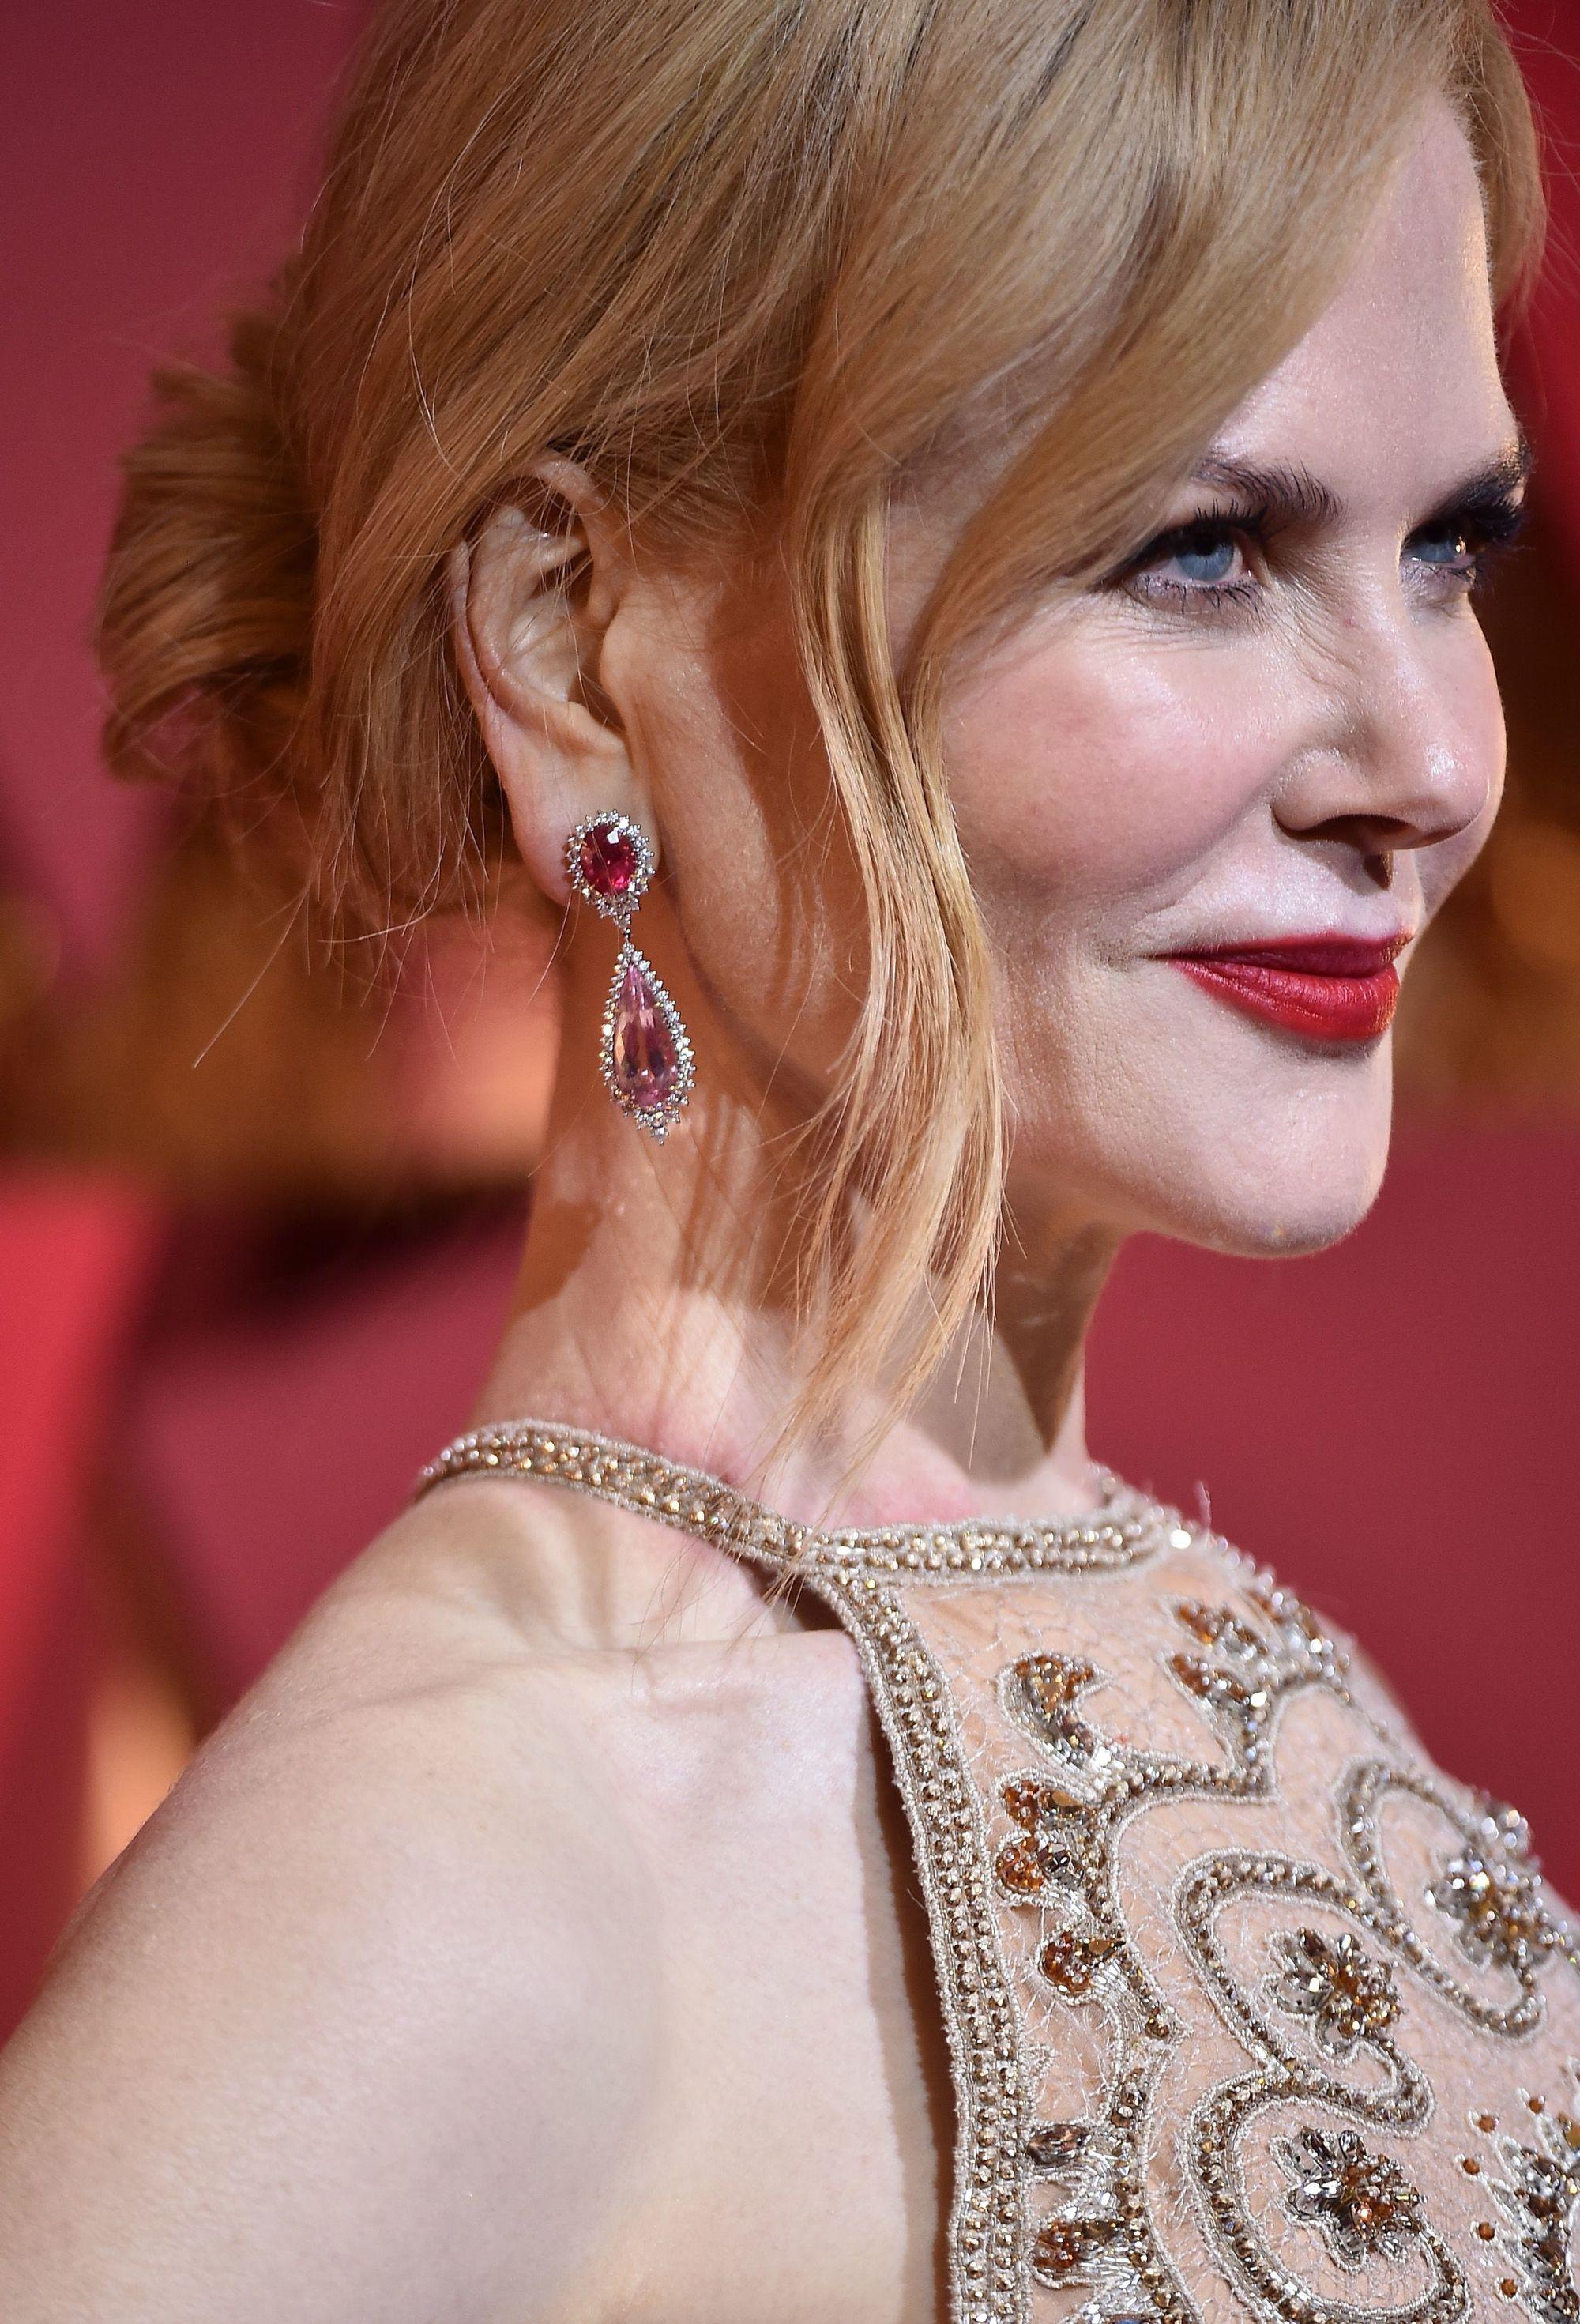 Nicole Kidman - Strawberry blonde hair - Updo